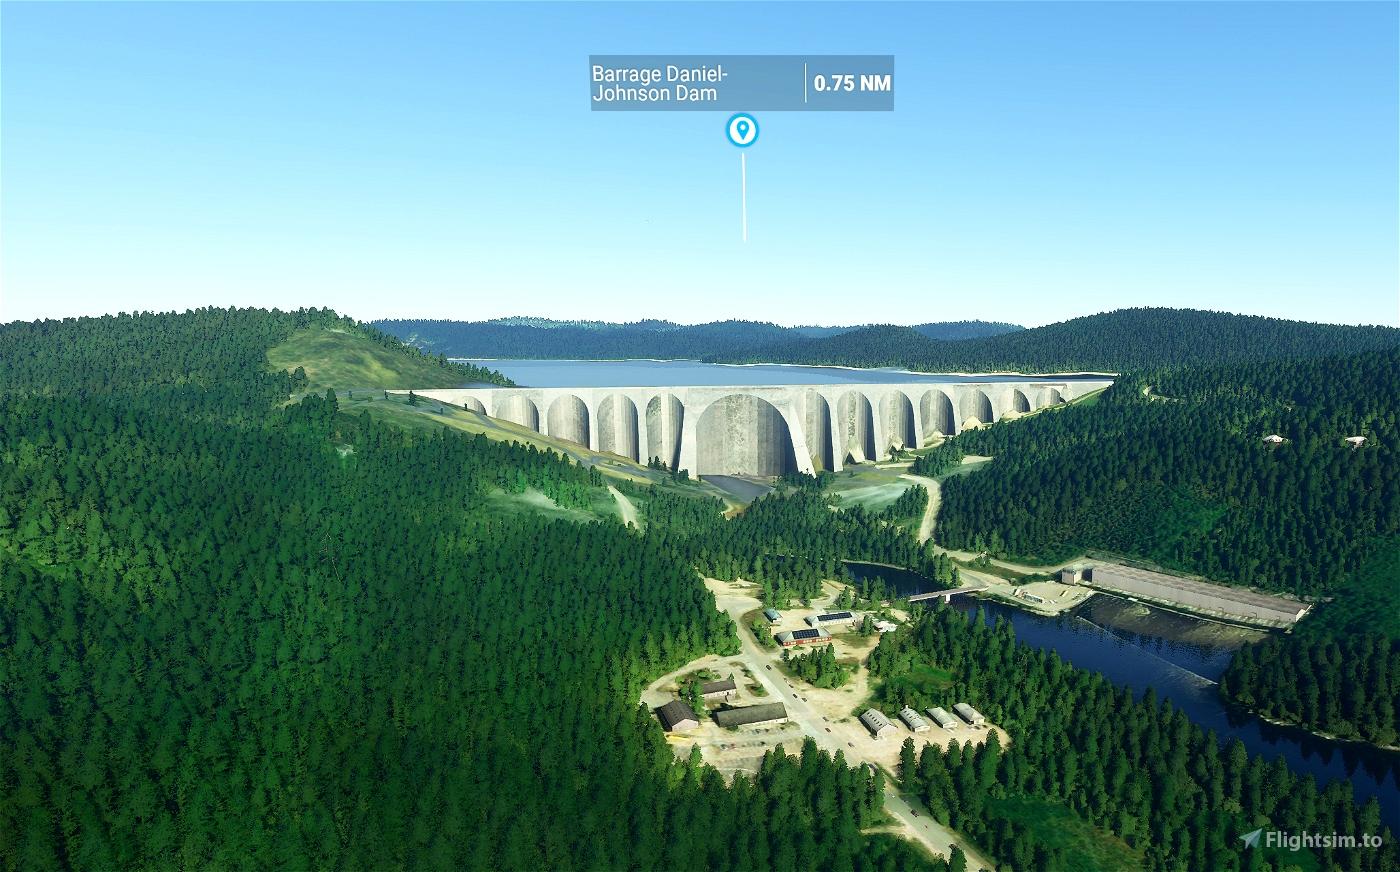 Daniel-Johnson Dam - Manic 5 Microsoft Flight Simulator